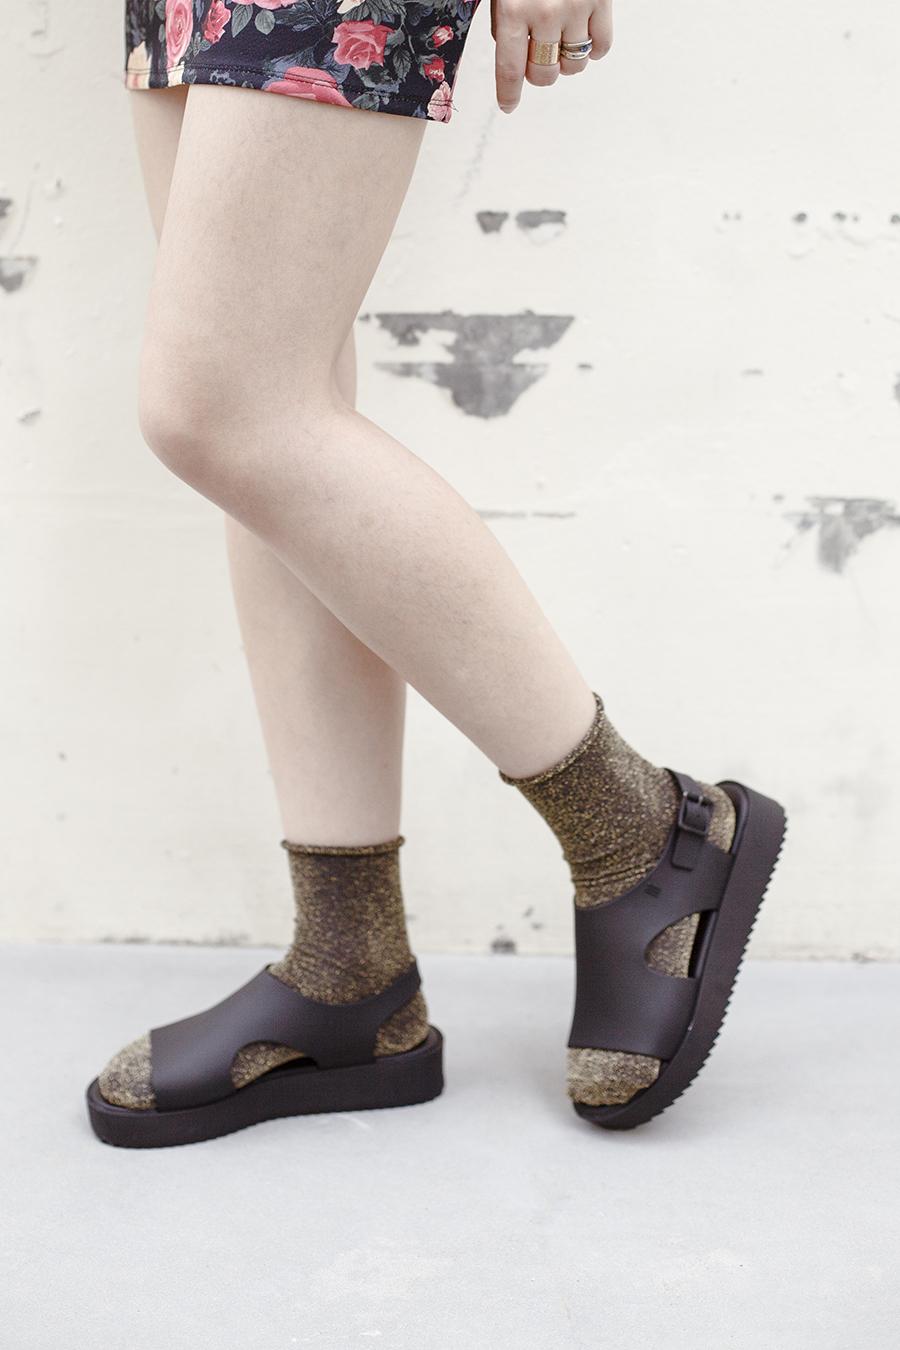 Topshop gold glitter socks, Melissa Hotness Platform Sandals, Forever 21 gold rings, Forever 21 floral skirt